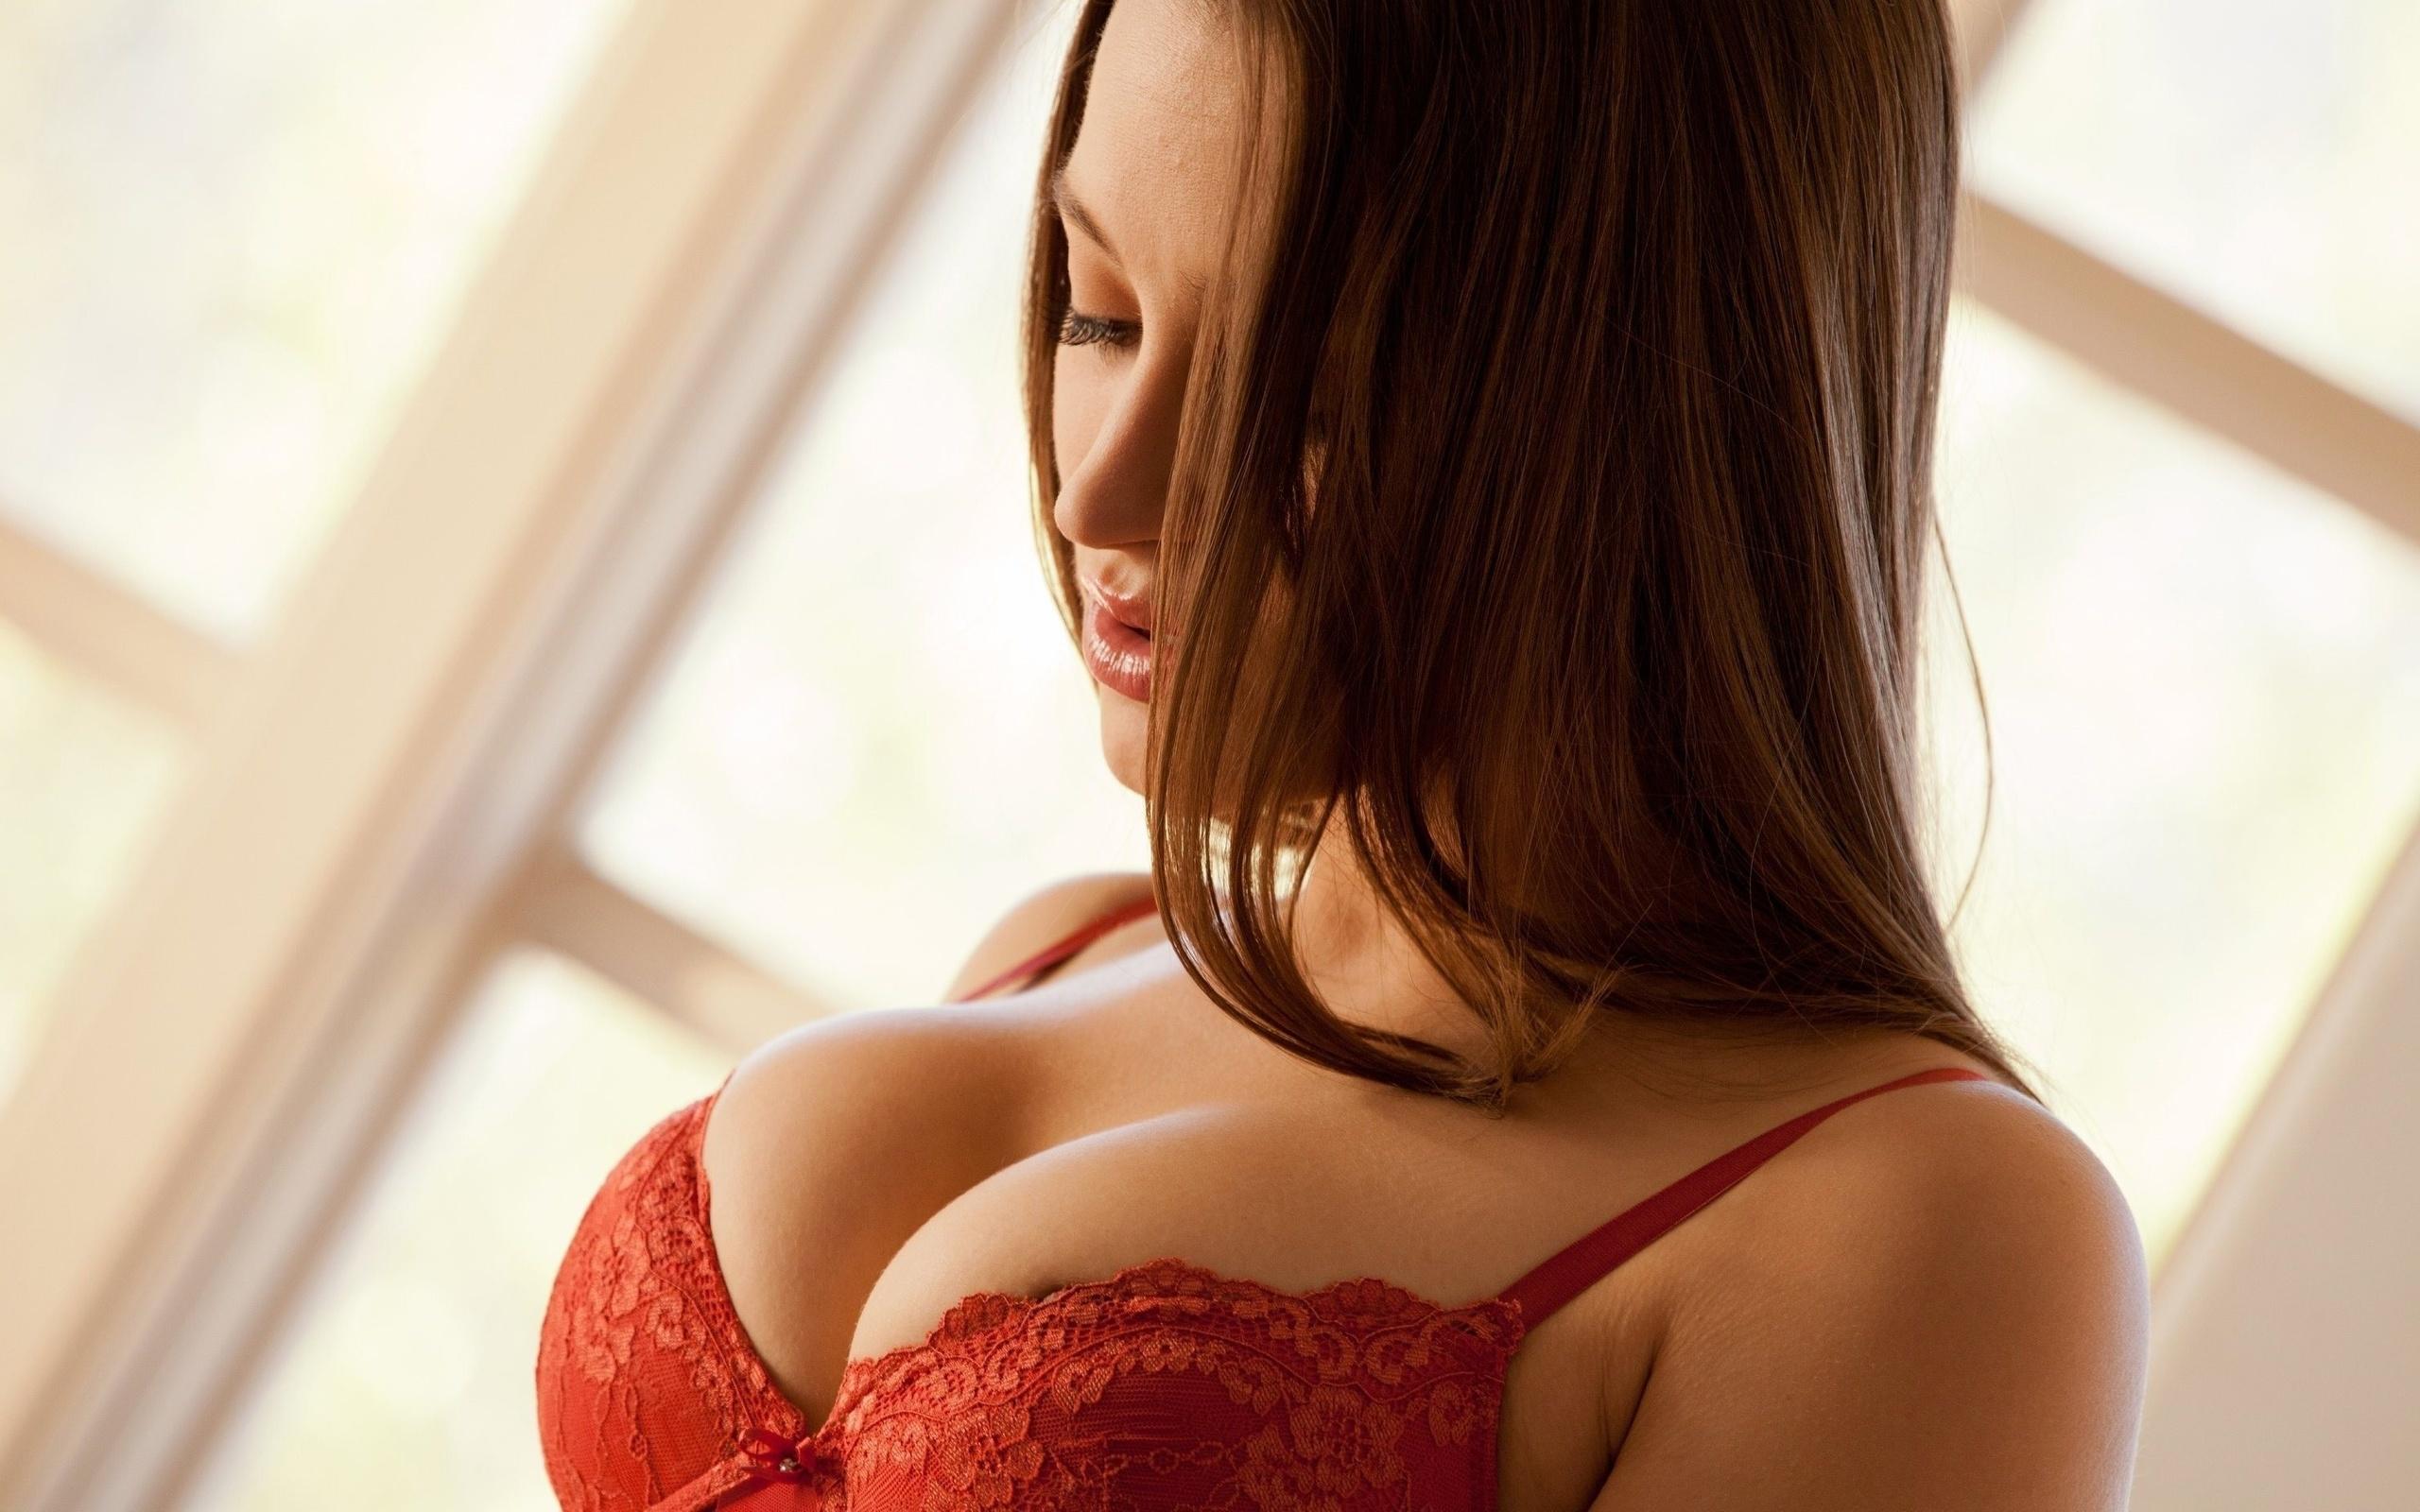 Sexy breast image amatuers having